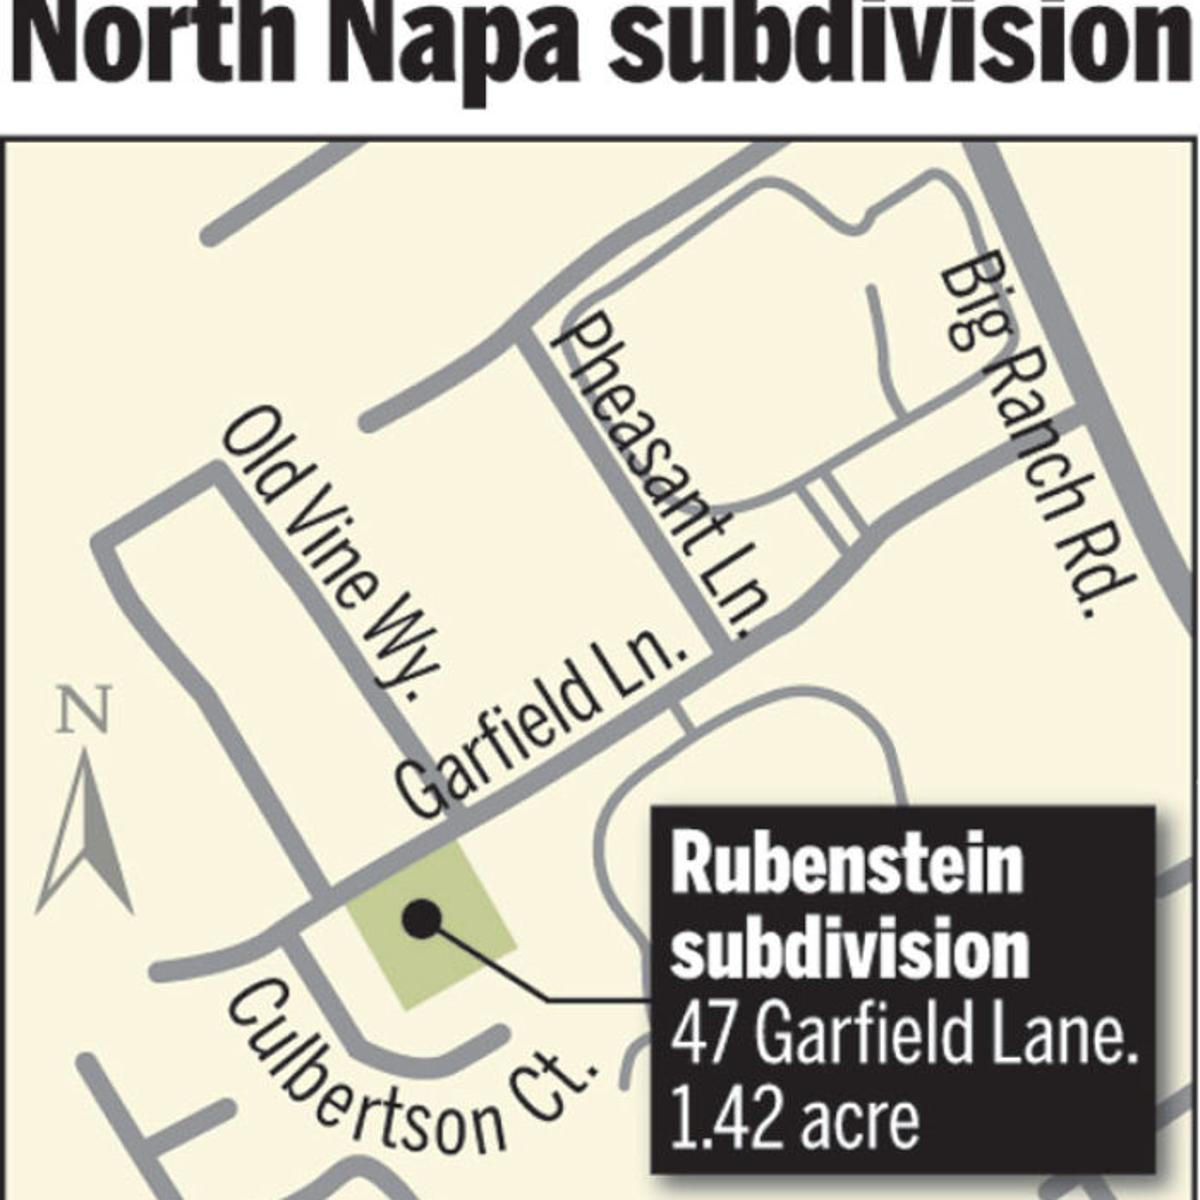 Planners Endorse 8 Home Development On Garfield Lane Local News Napavalleyregister Com